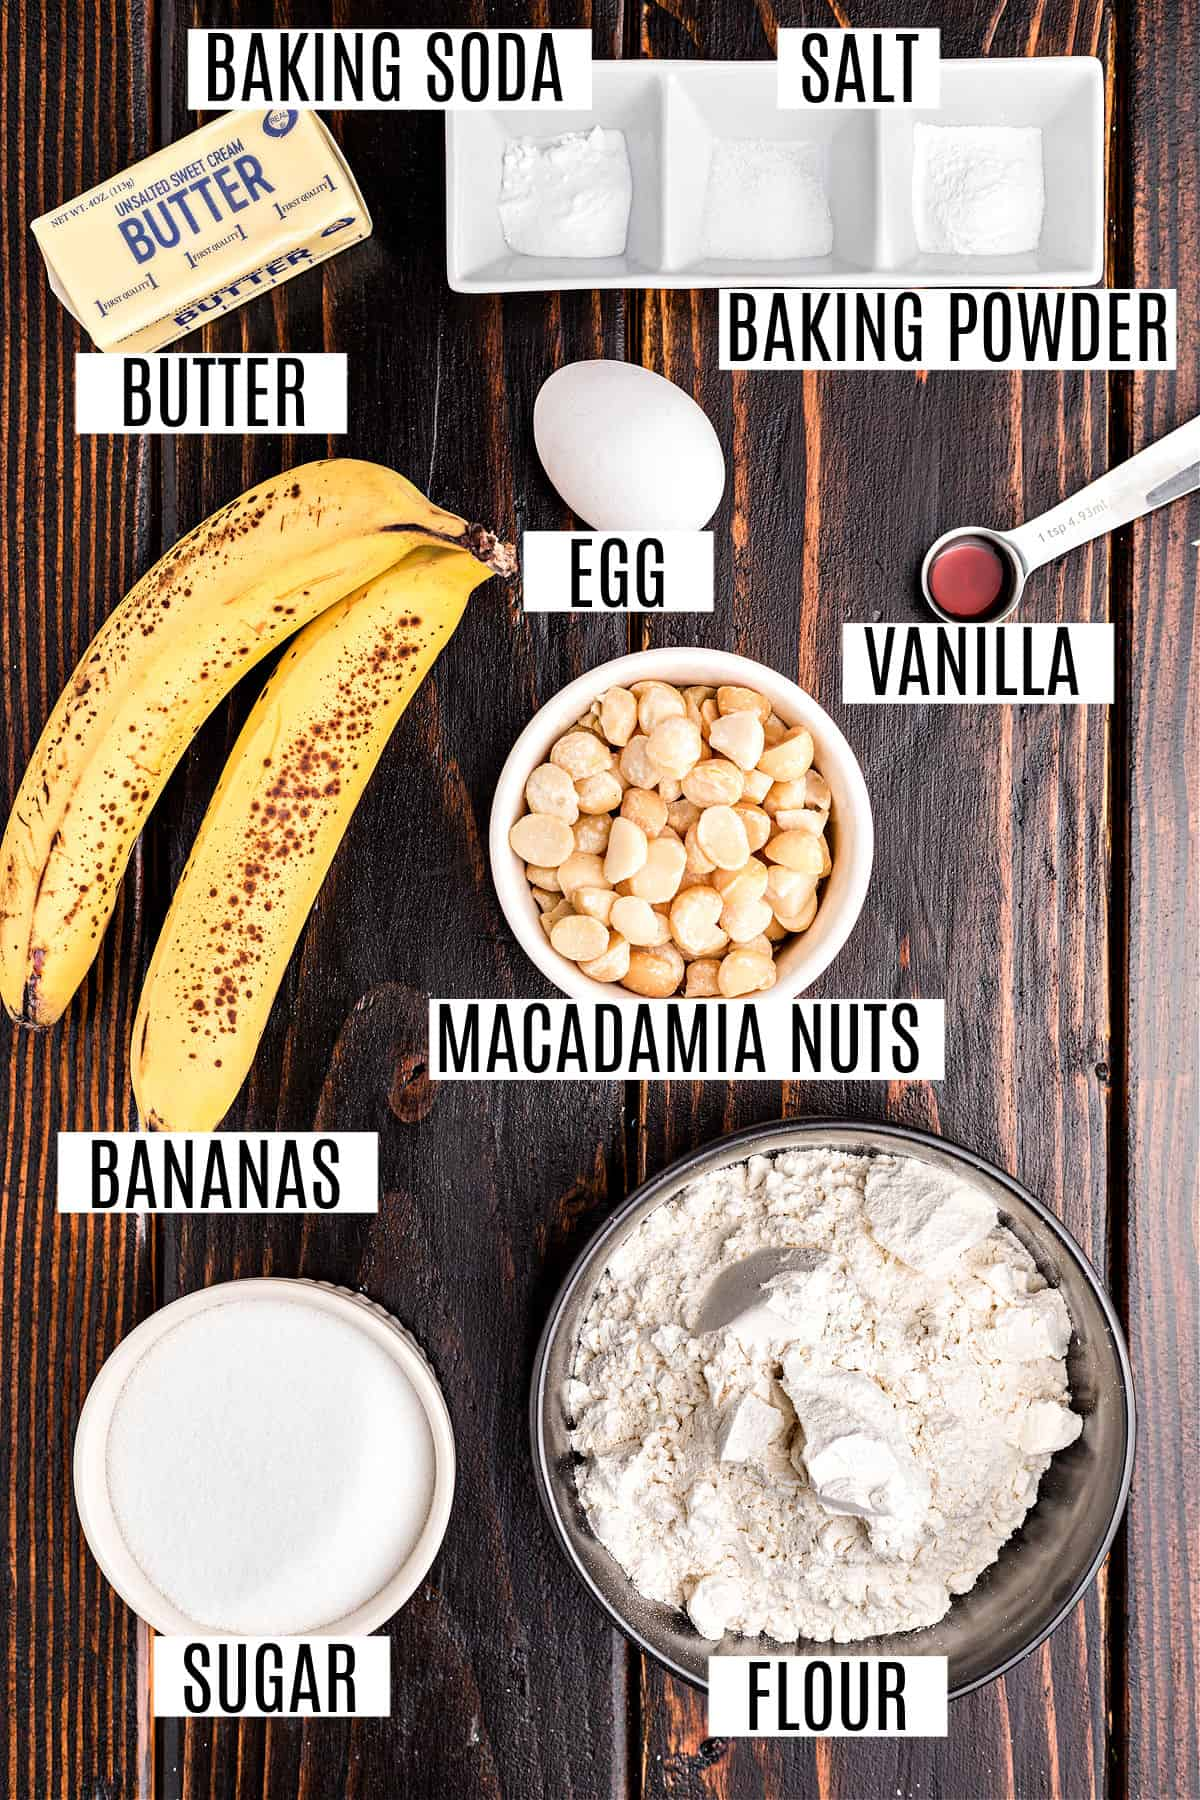 Ingredients needed for banana macadamia nut cake recipe.